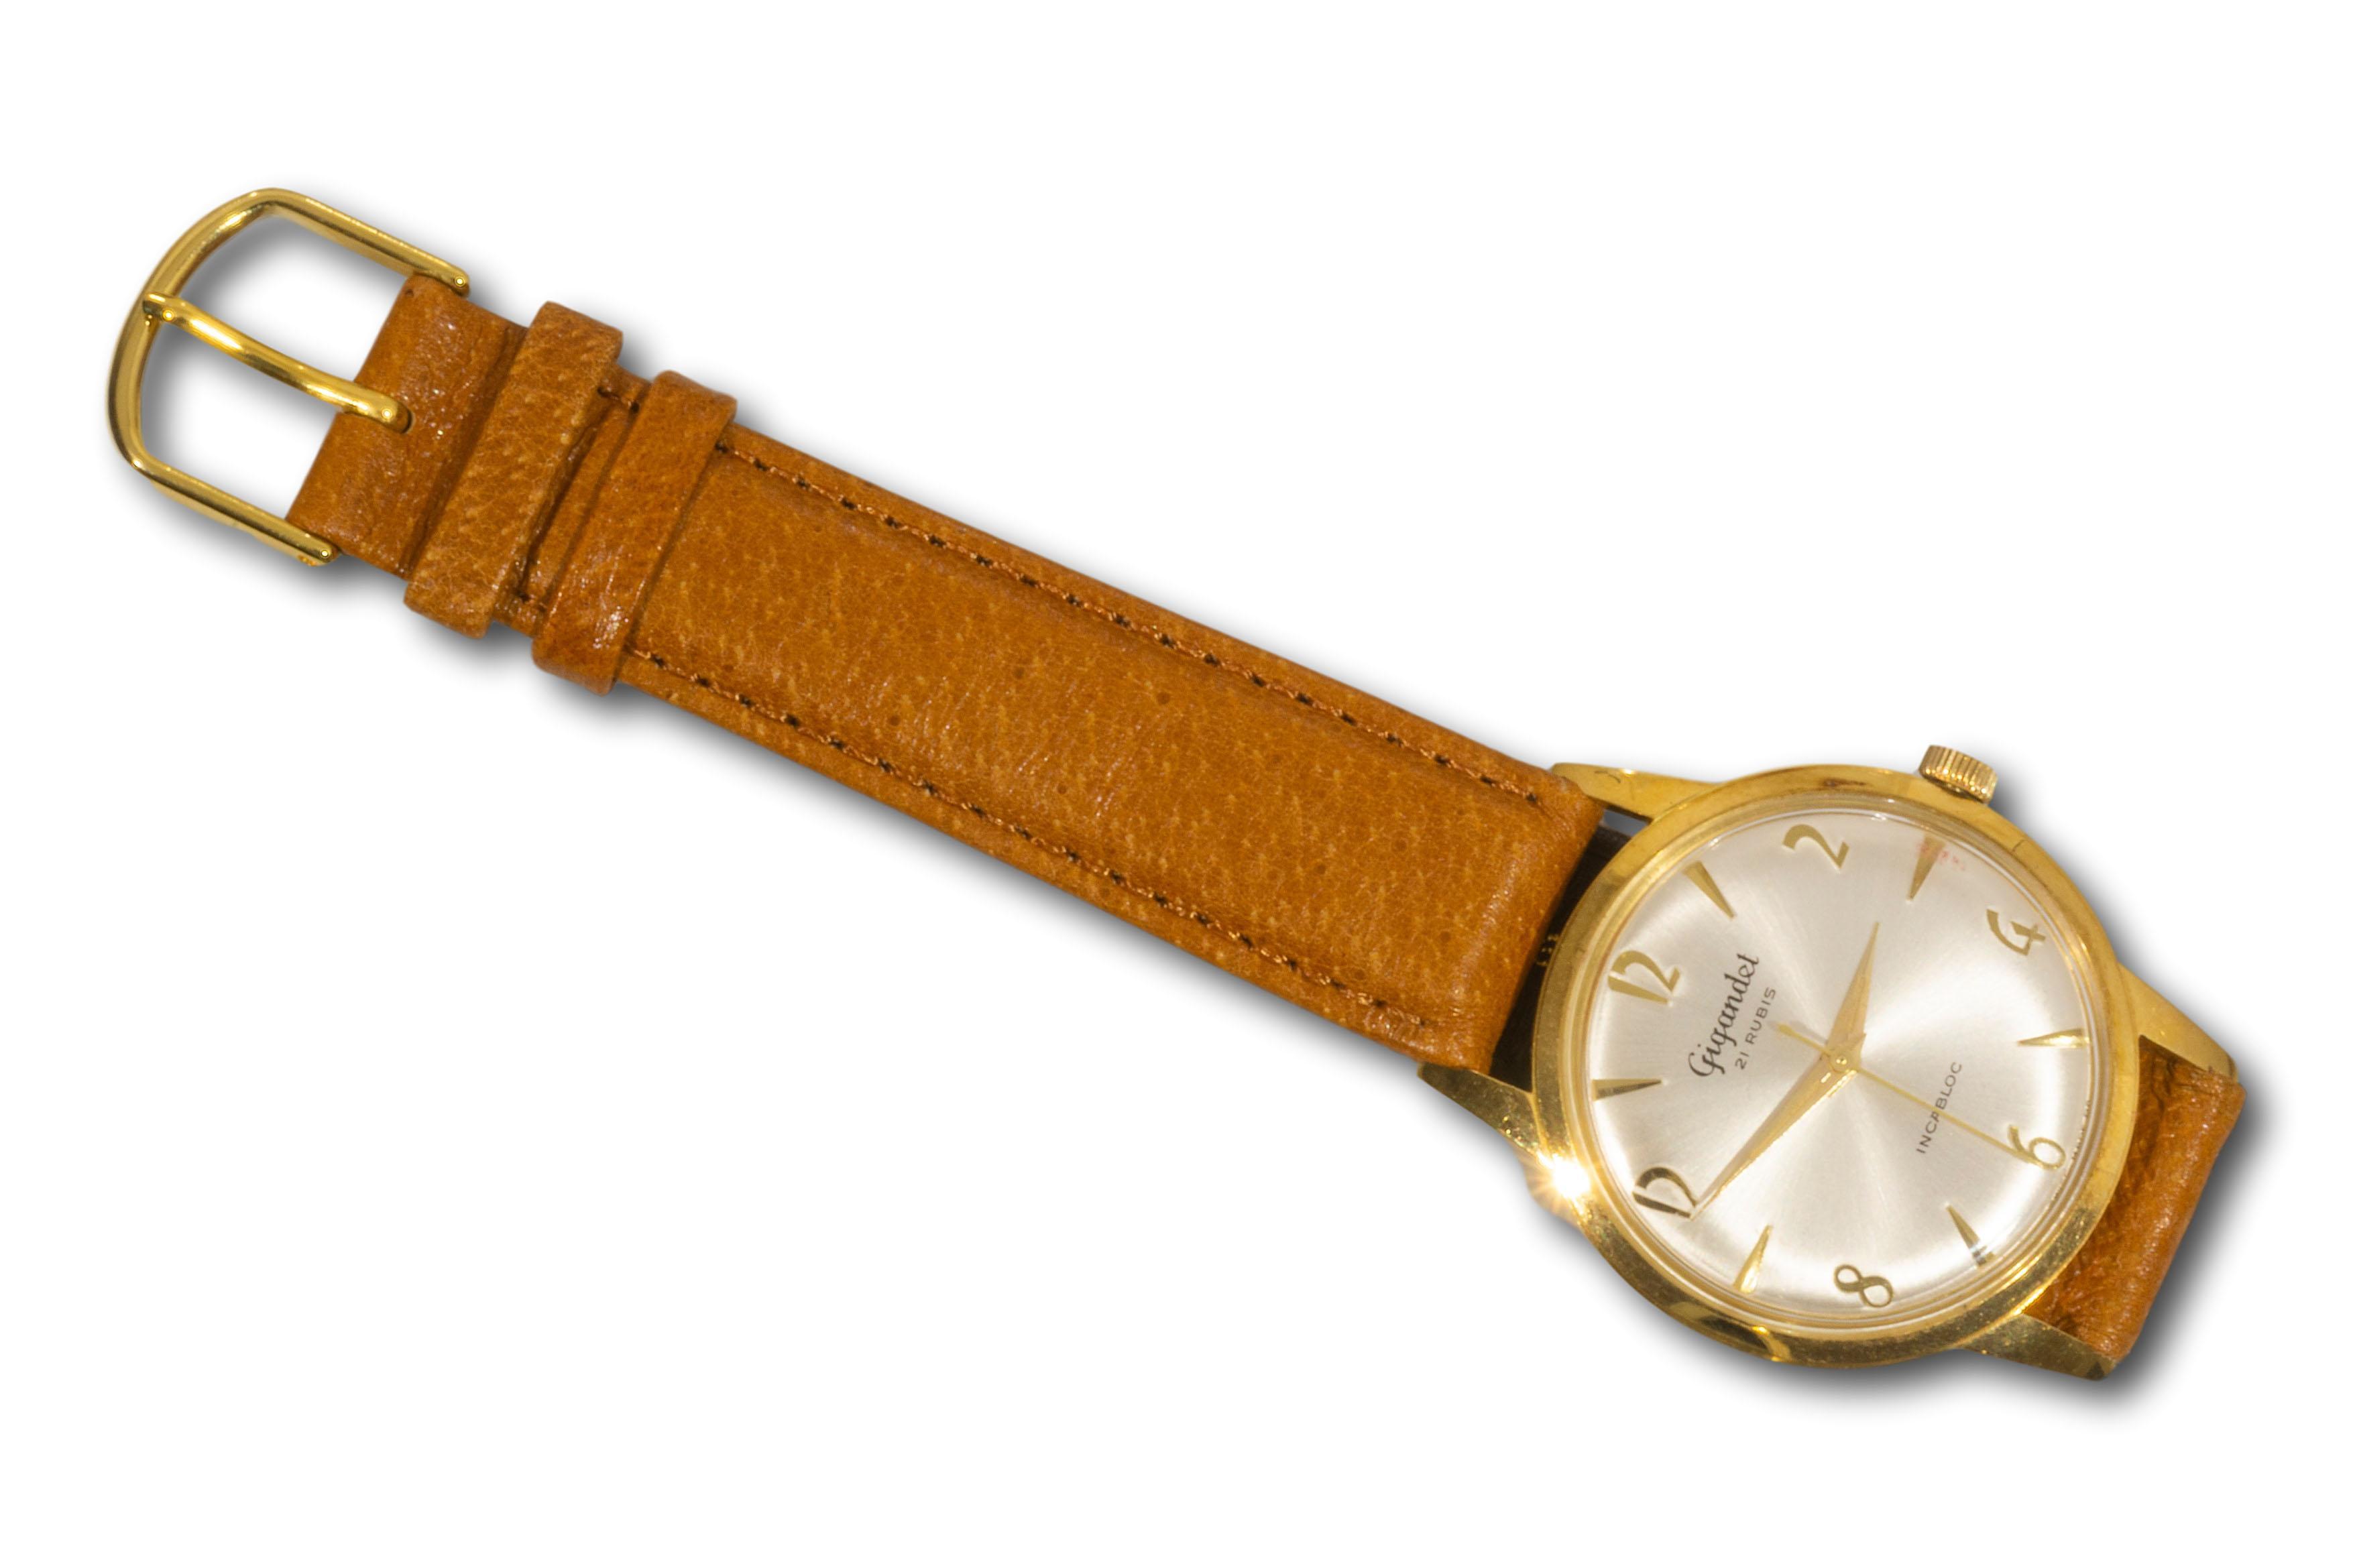 A Gigandet 18kt Gold Plated 21 Rubis Incabloc Wristwatch Circa 1960, A/F